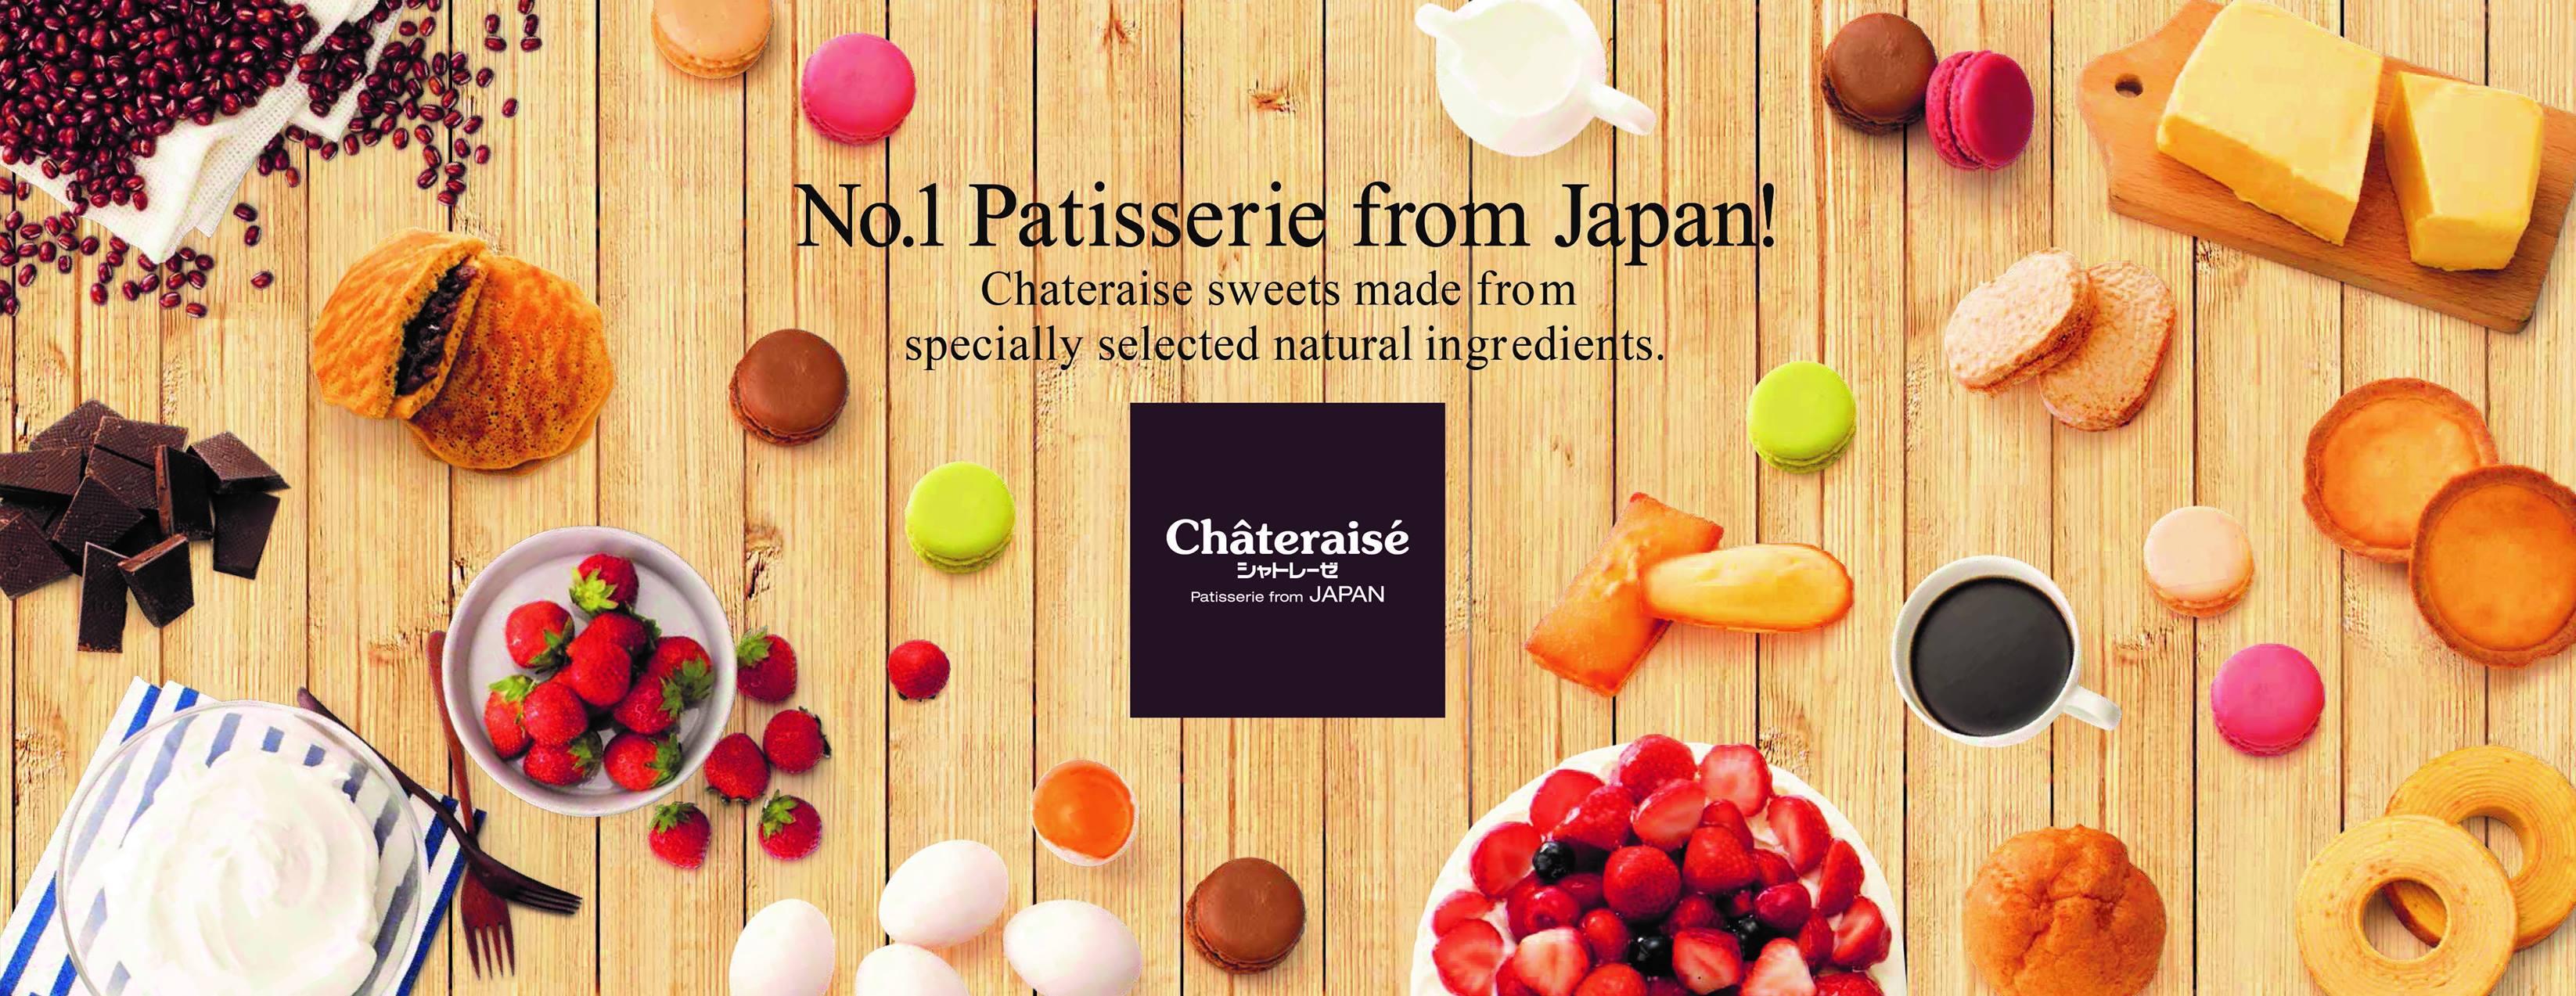 Chateraise (淘大商場)